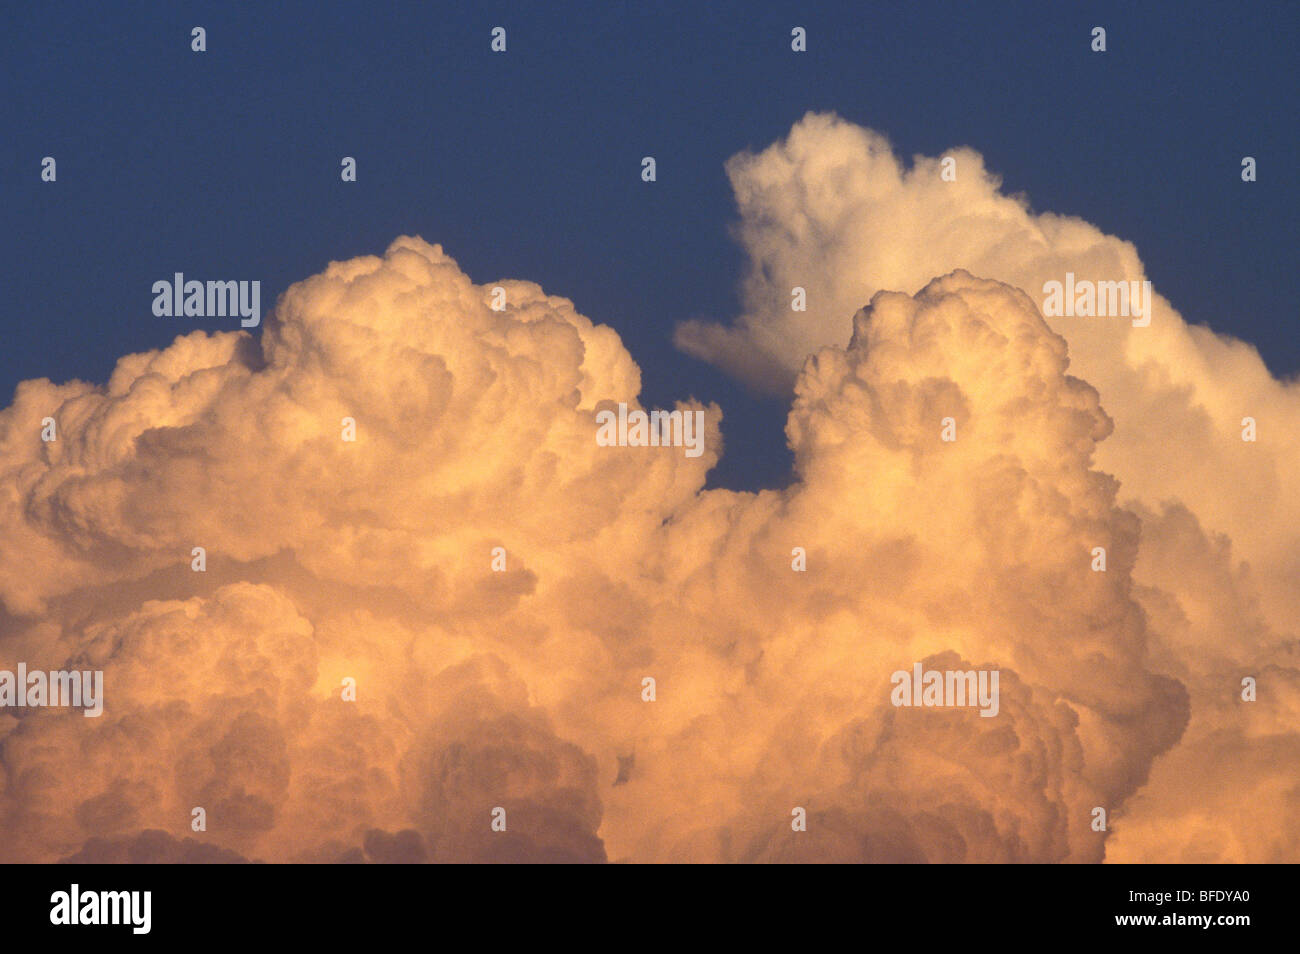 Bedrohlich Cumulonimbus Wolke Gebäude gegen blauen Himmel ...